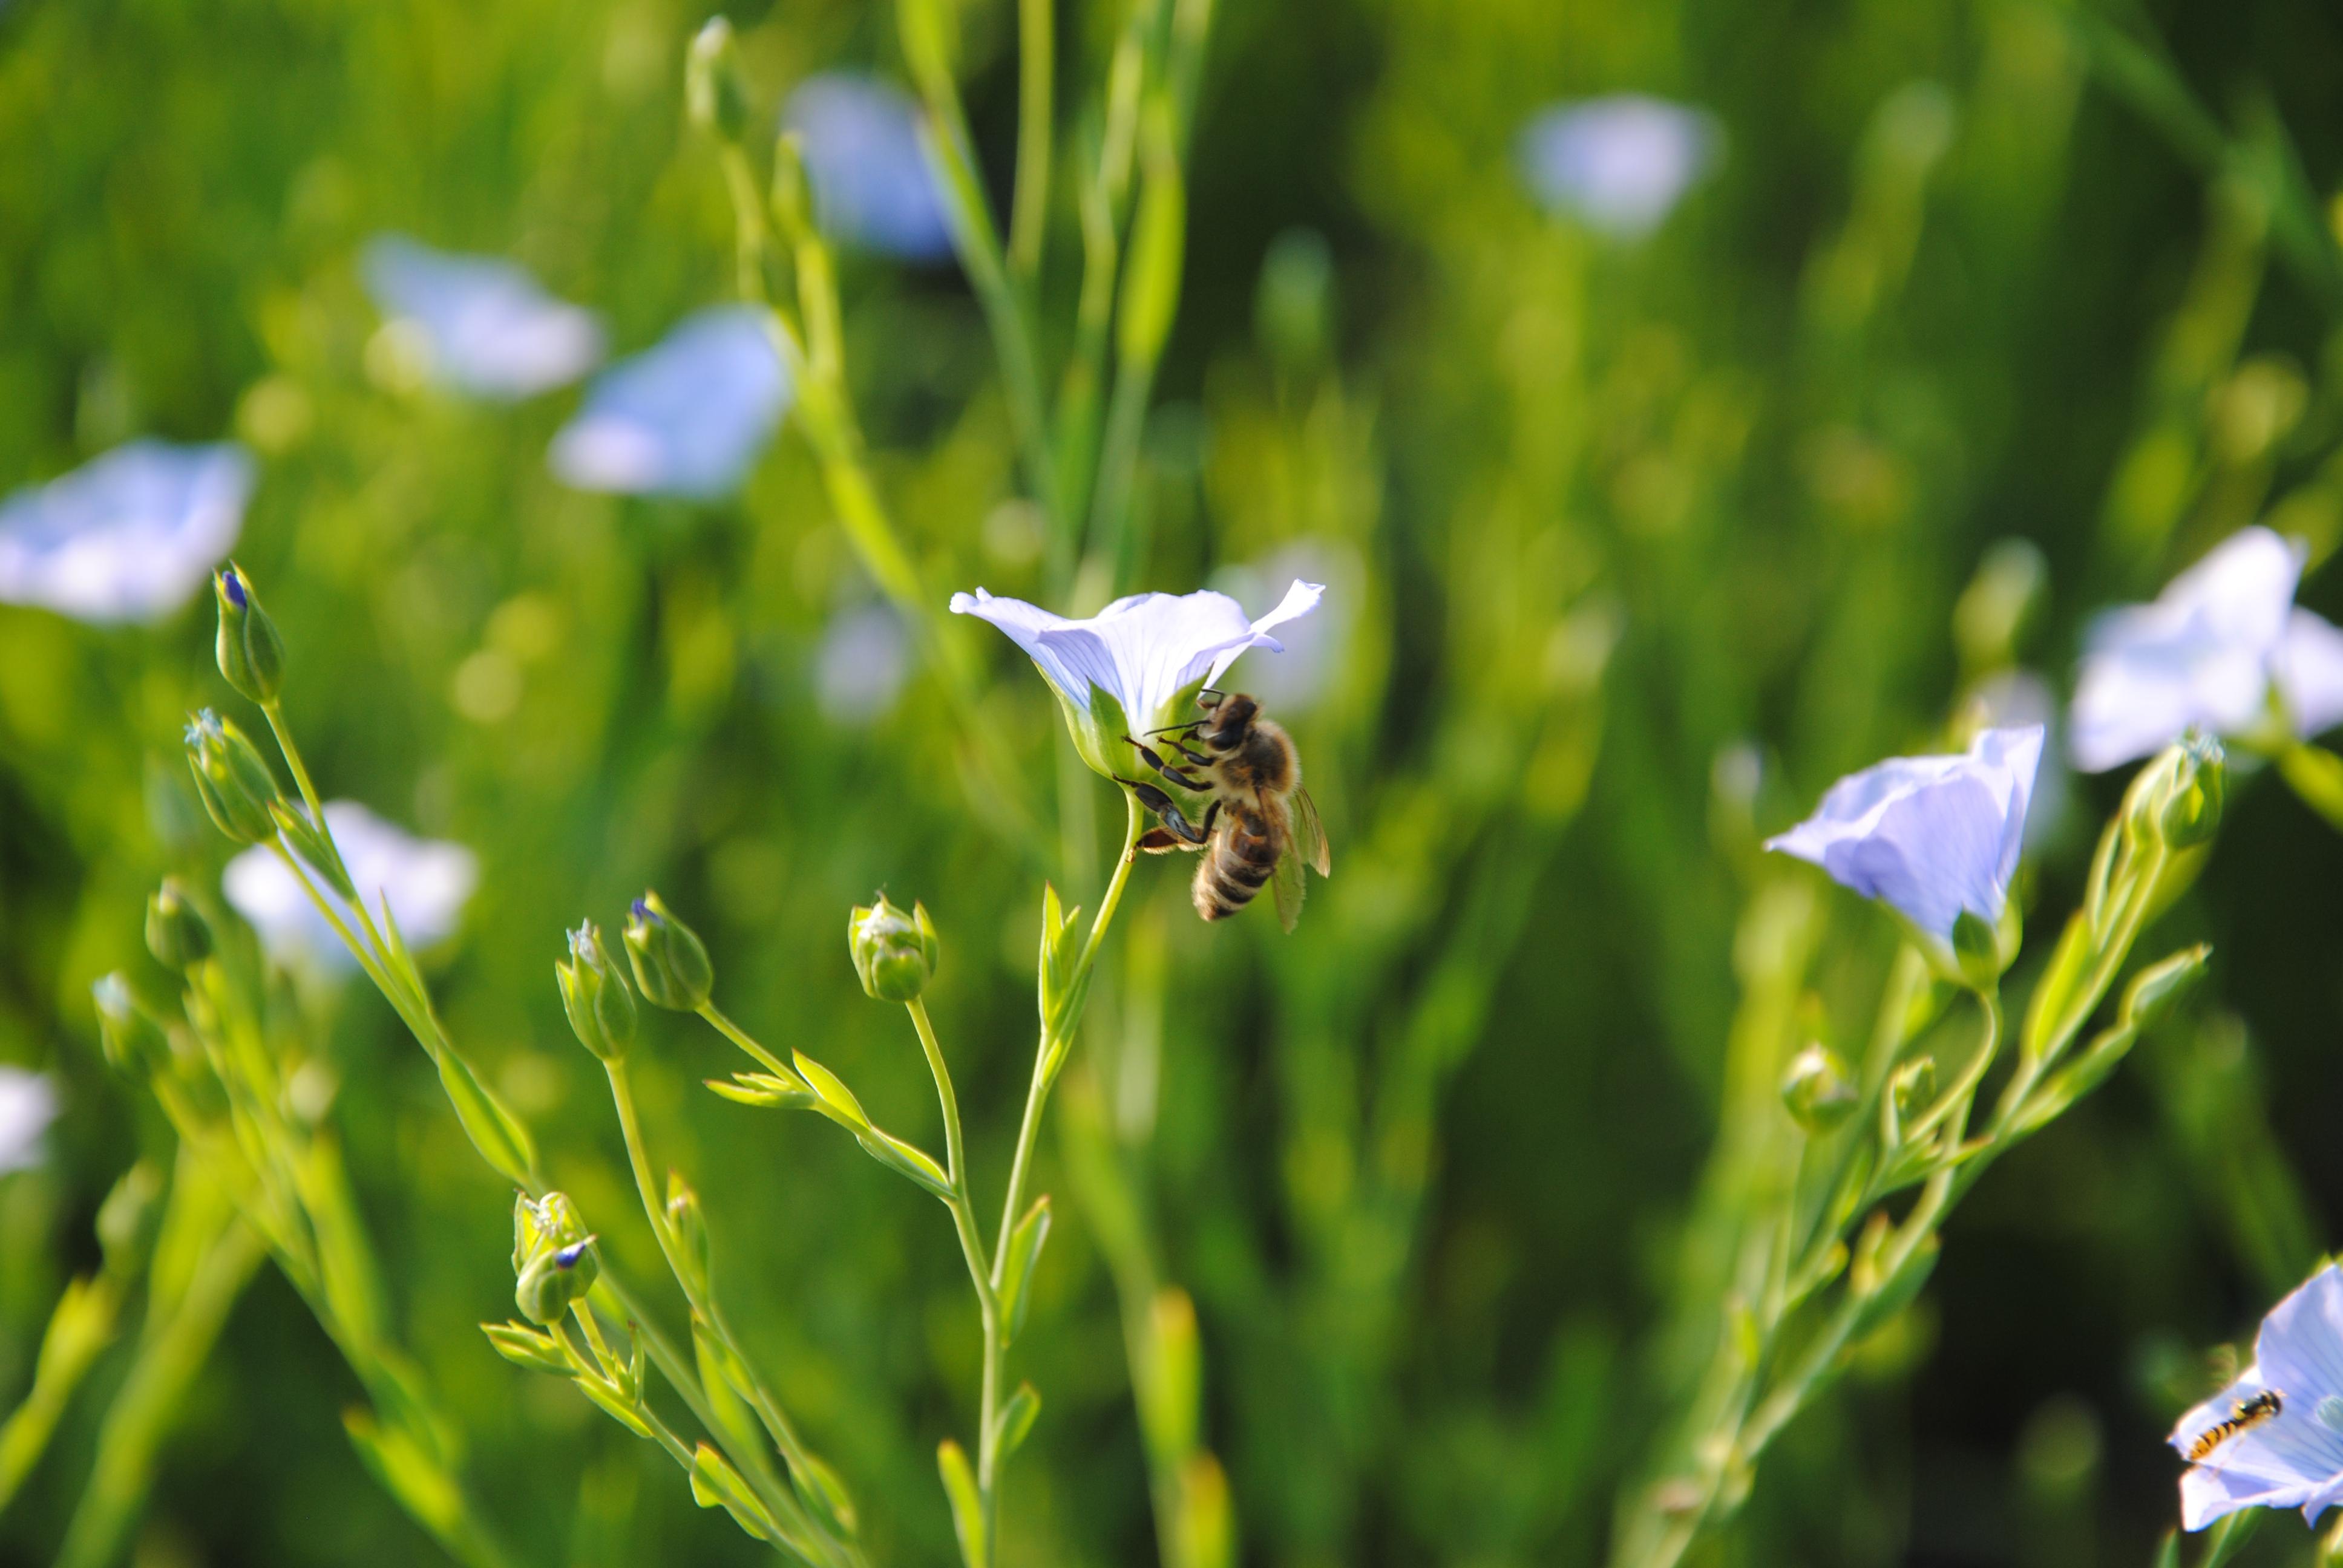 lan in čebela